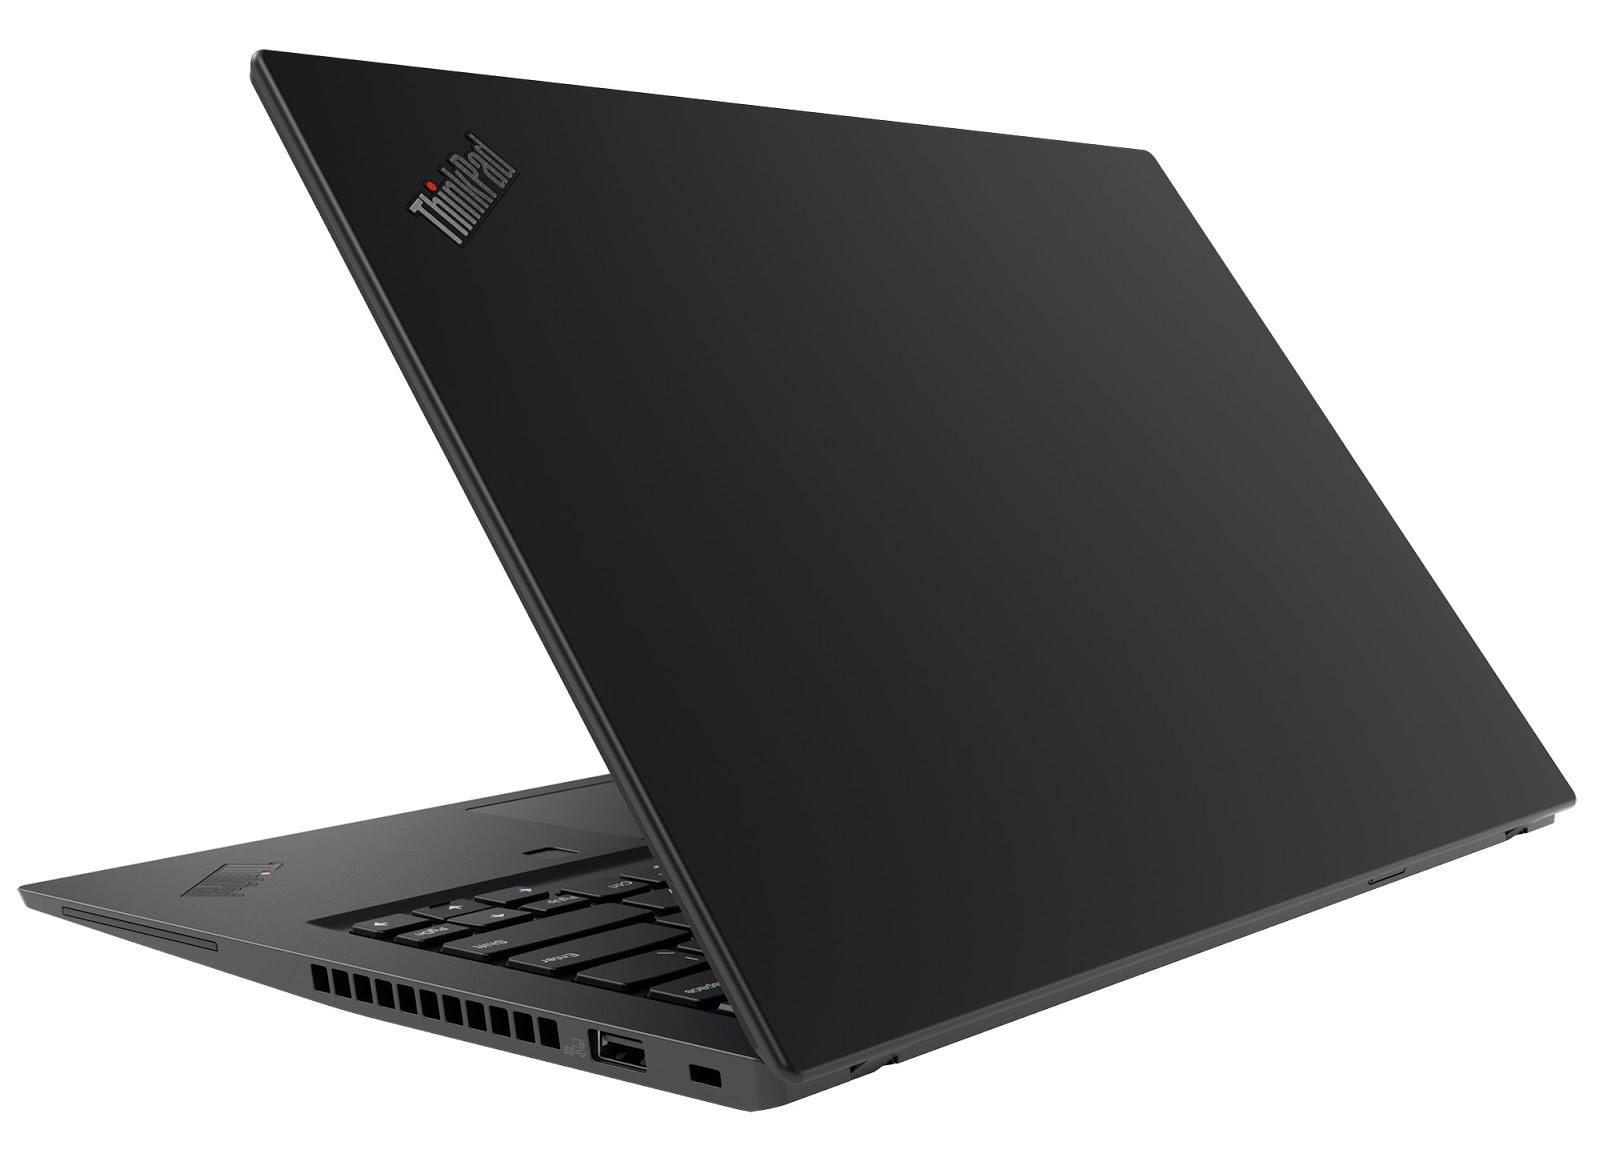 Фото 2. Ноутбук Lenovo ThinkPad T14s Gen 1 Black (20T0001DRT)